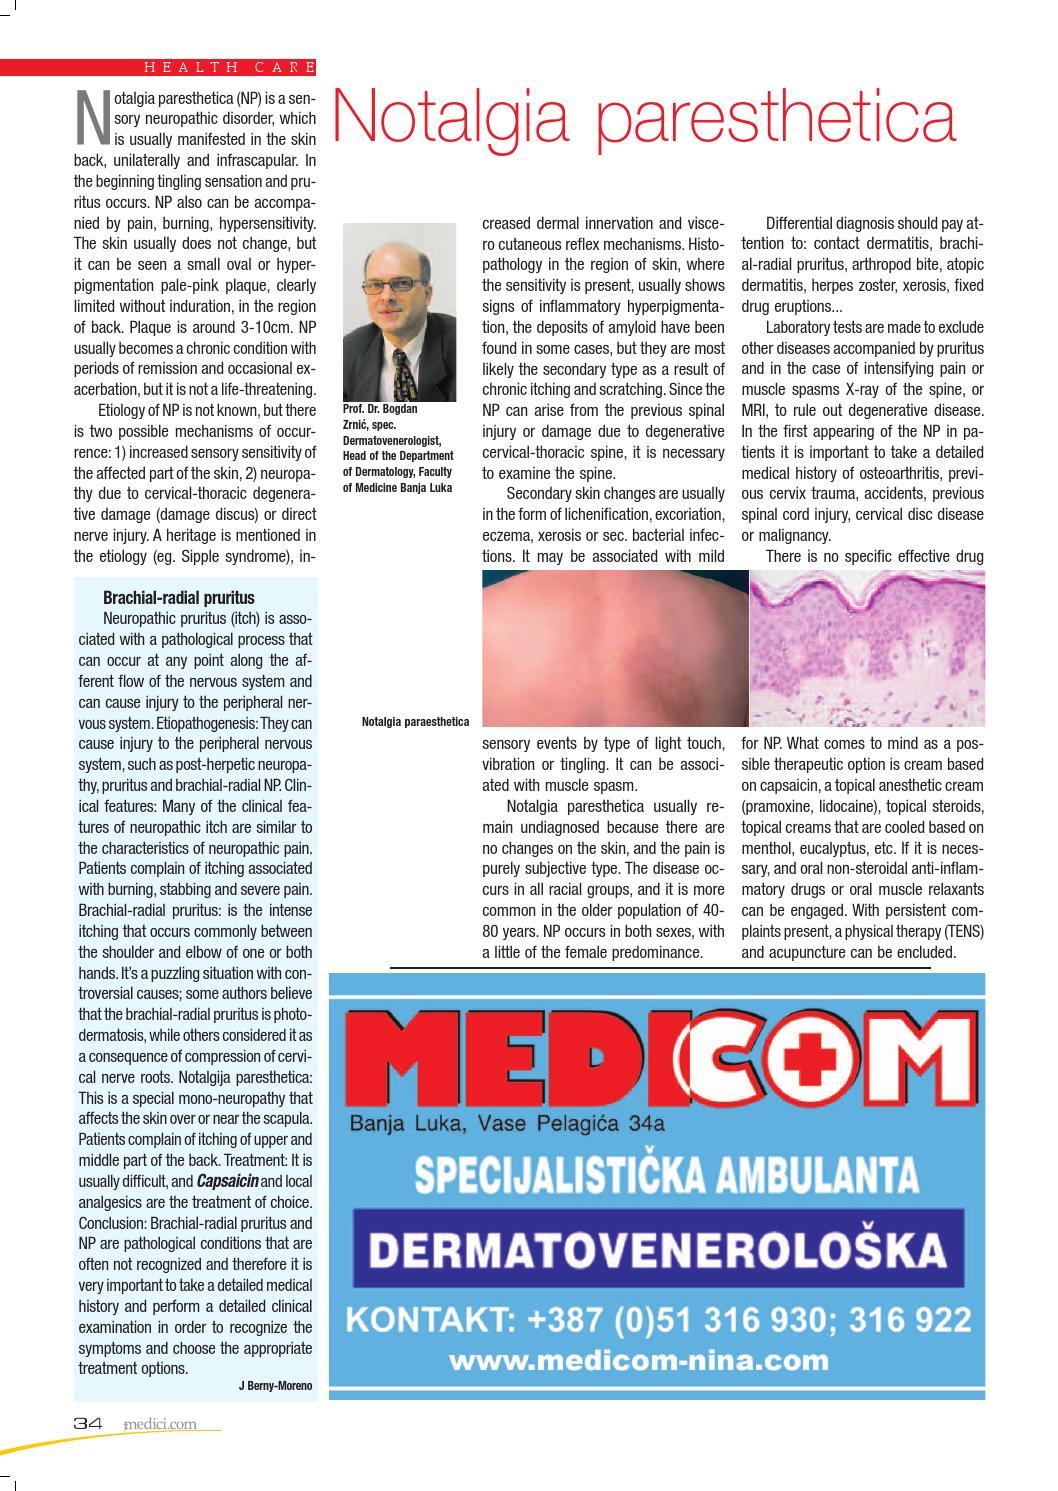 notalgia parestésica cura para la diabetes